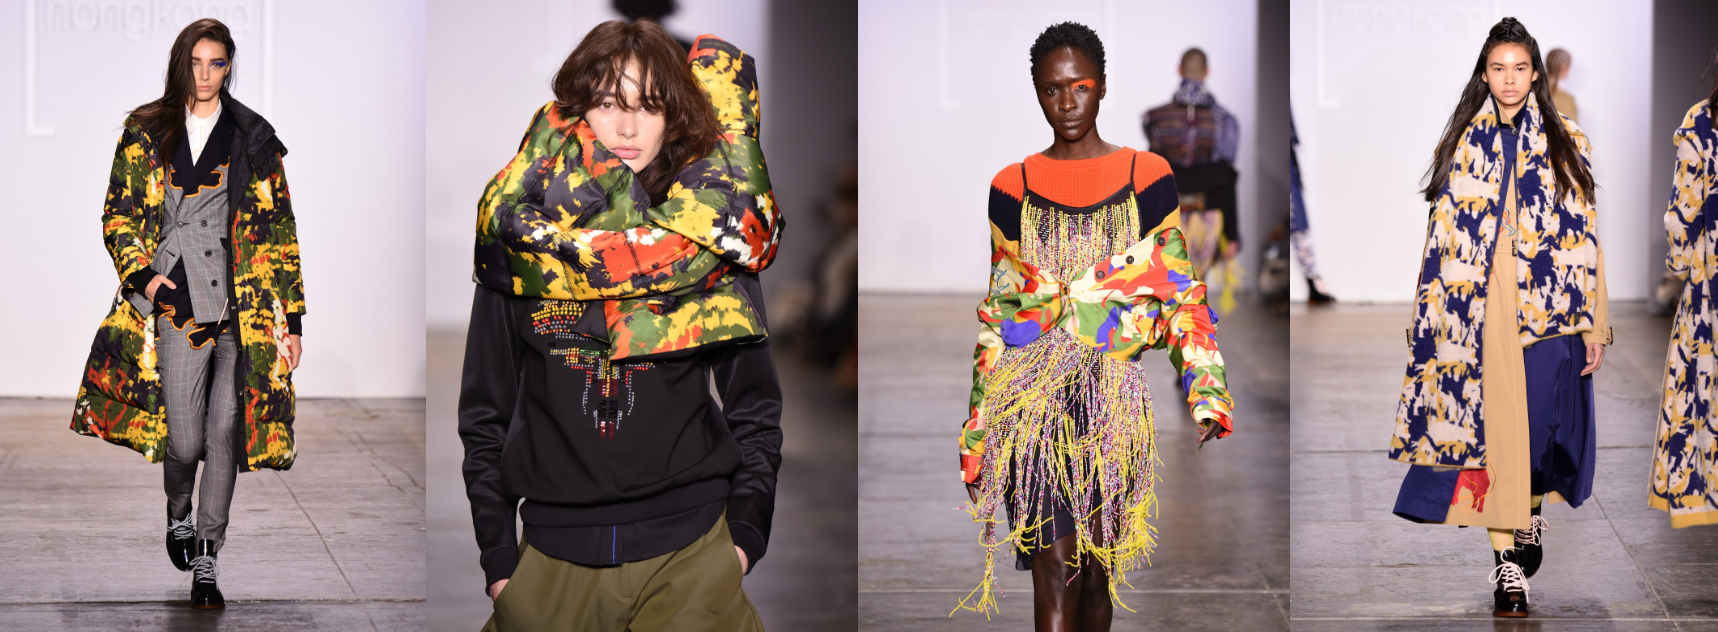 Fashion Hong Kong Takes It To The Stratosphere Of Creativity Fabulous Fashion Avenue News Magazine